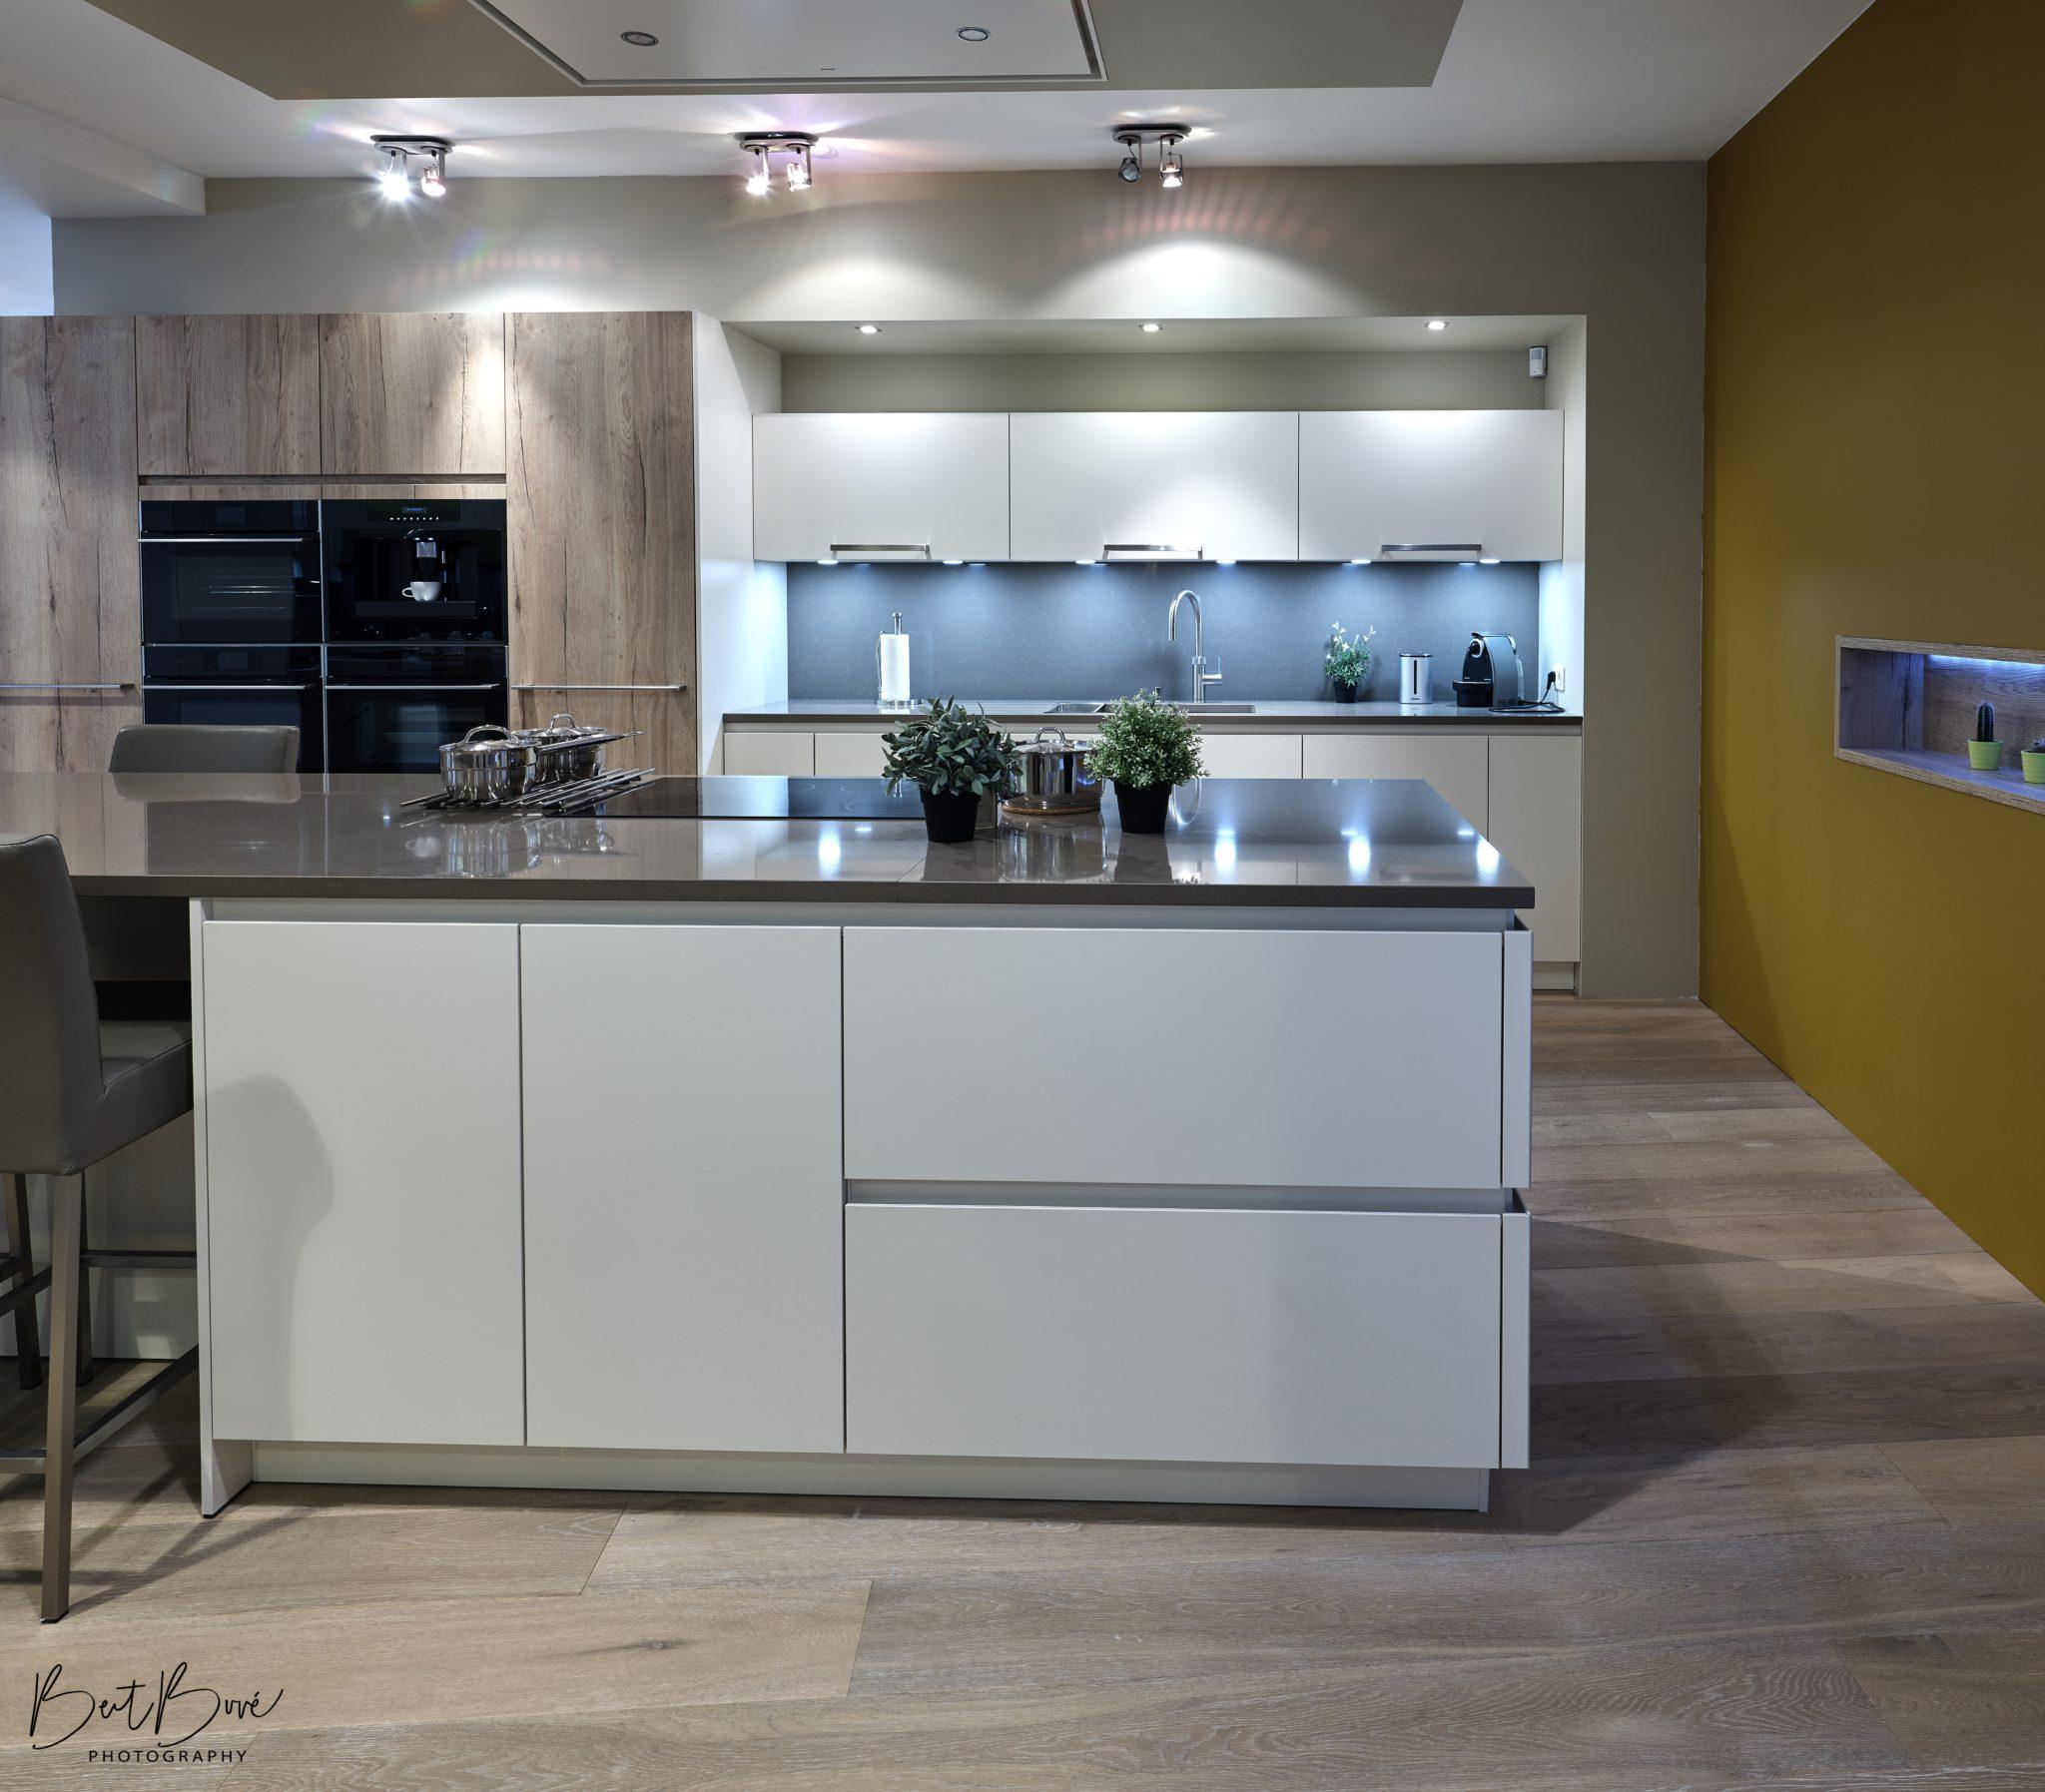 toonzaal keukens 2018 1 1 buv keukens